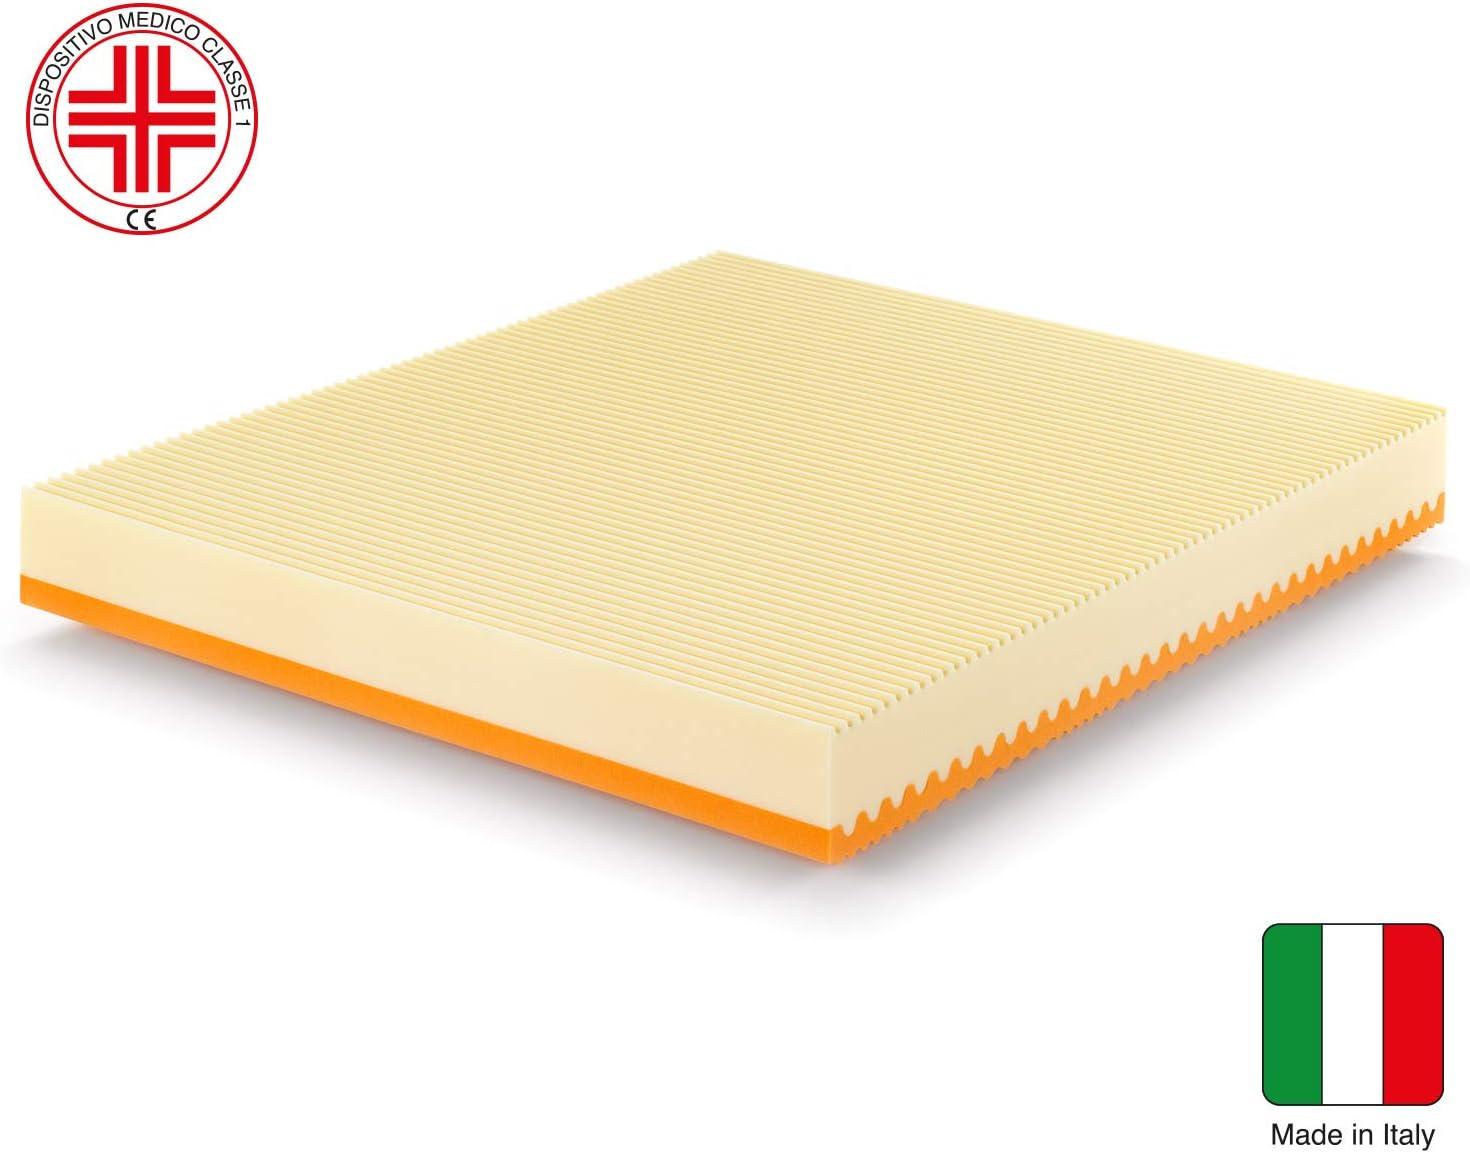 Marcapiuma - Colchón viscoelástico Matrimonio Memory 150x190 Alto 20 cm - Sunrise Plus - H2 Medio/Firme 5 Zonas Producto Sanitario CE Funda ...